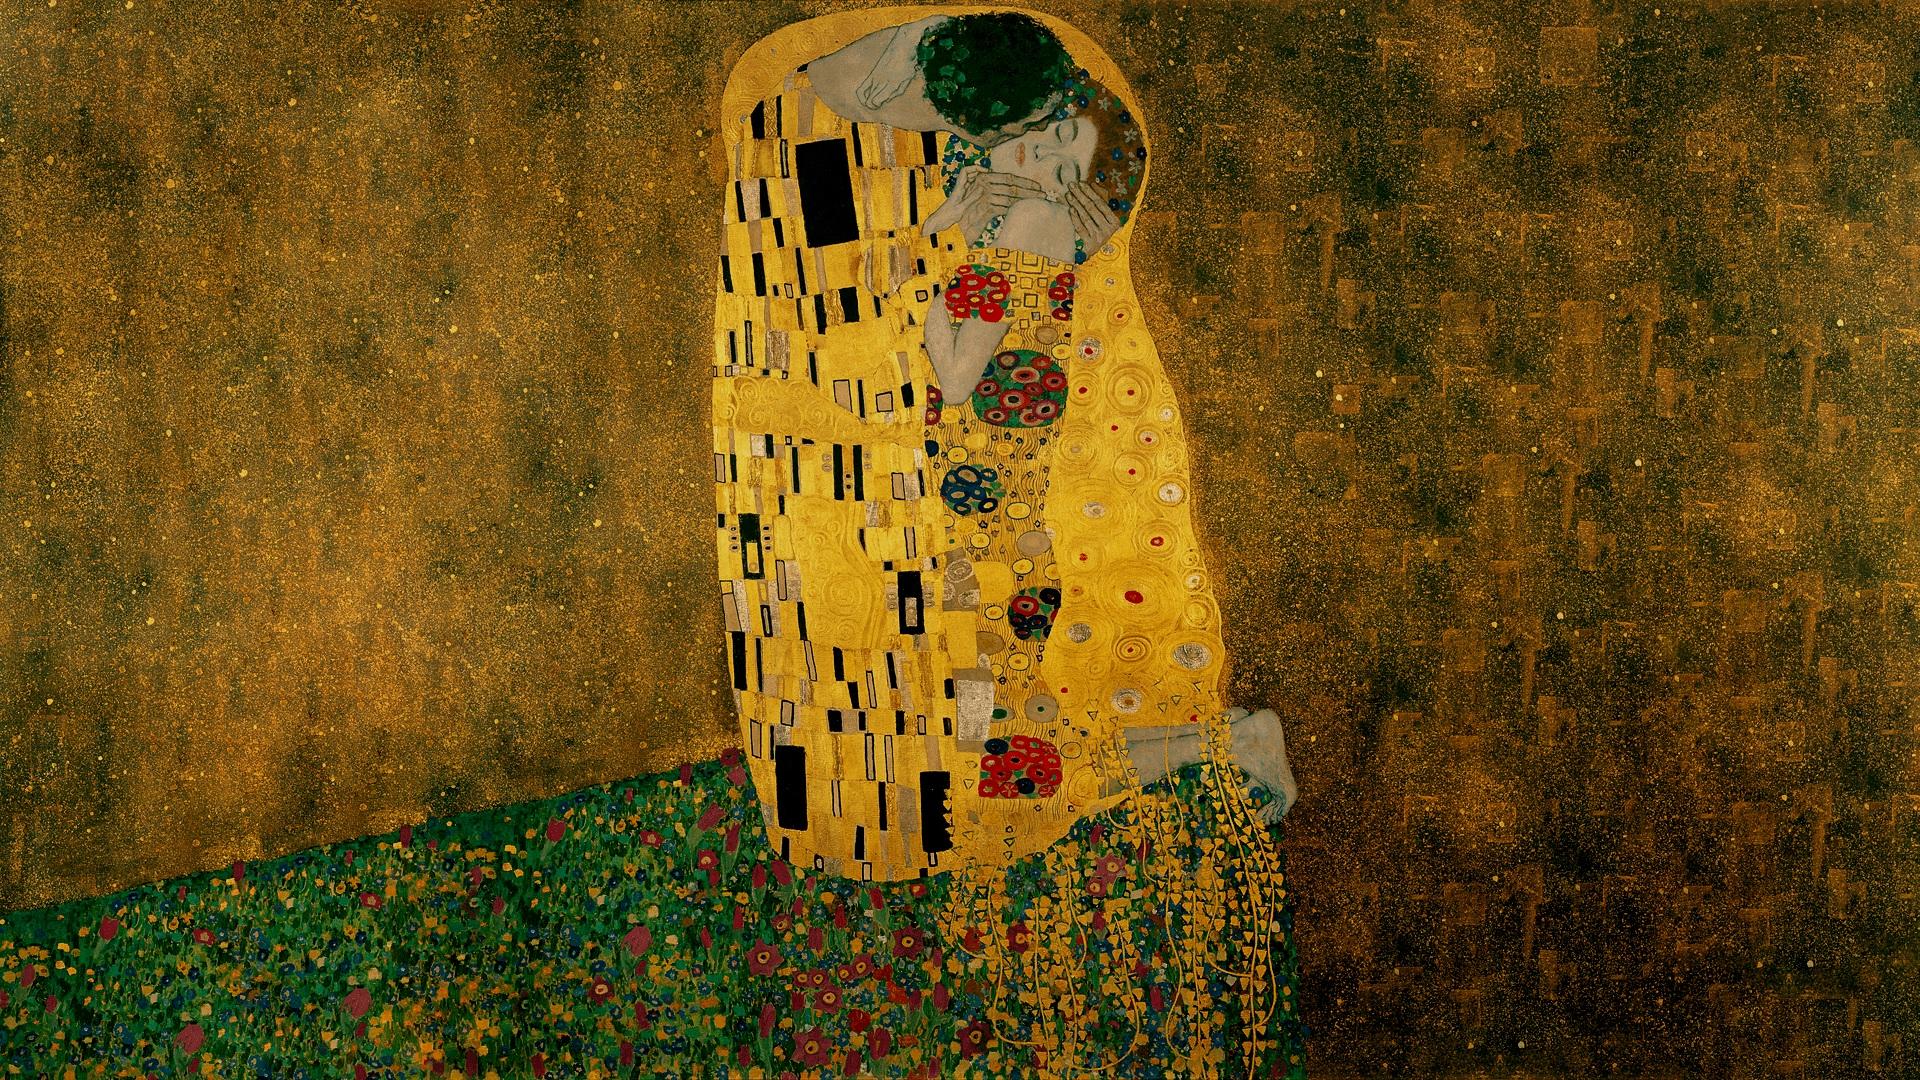 """Art is a line around your thoughts."" - -Gustav Klimt"